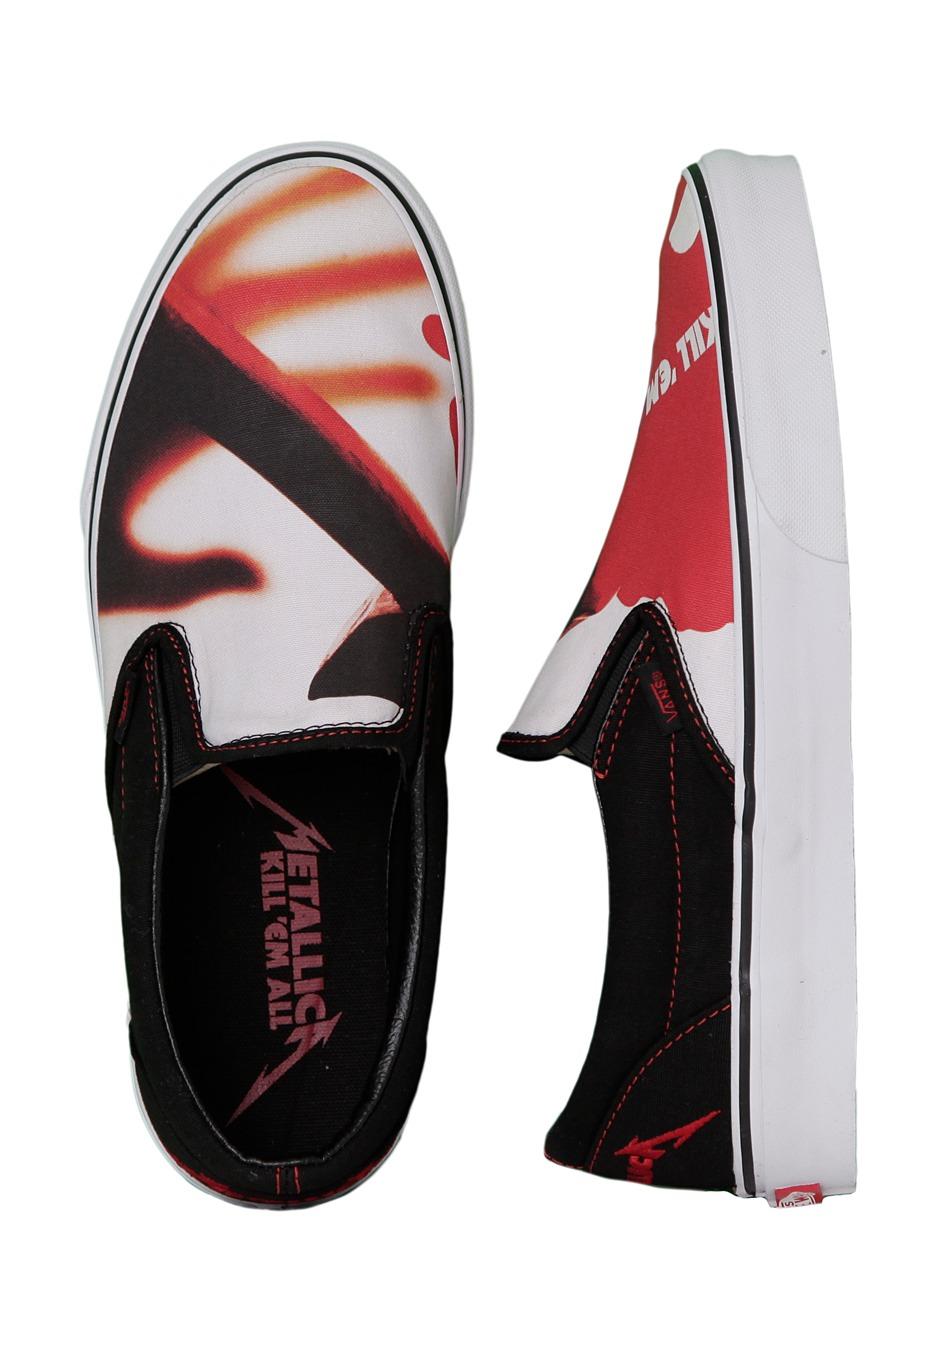 c89e8fec20 Vans - Classic Slip-On Metallica Kill ´Em All Black True White - Shoes -  Impericon.com UK